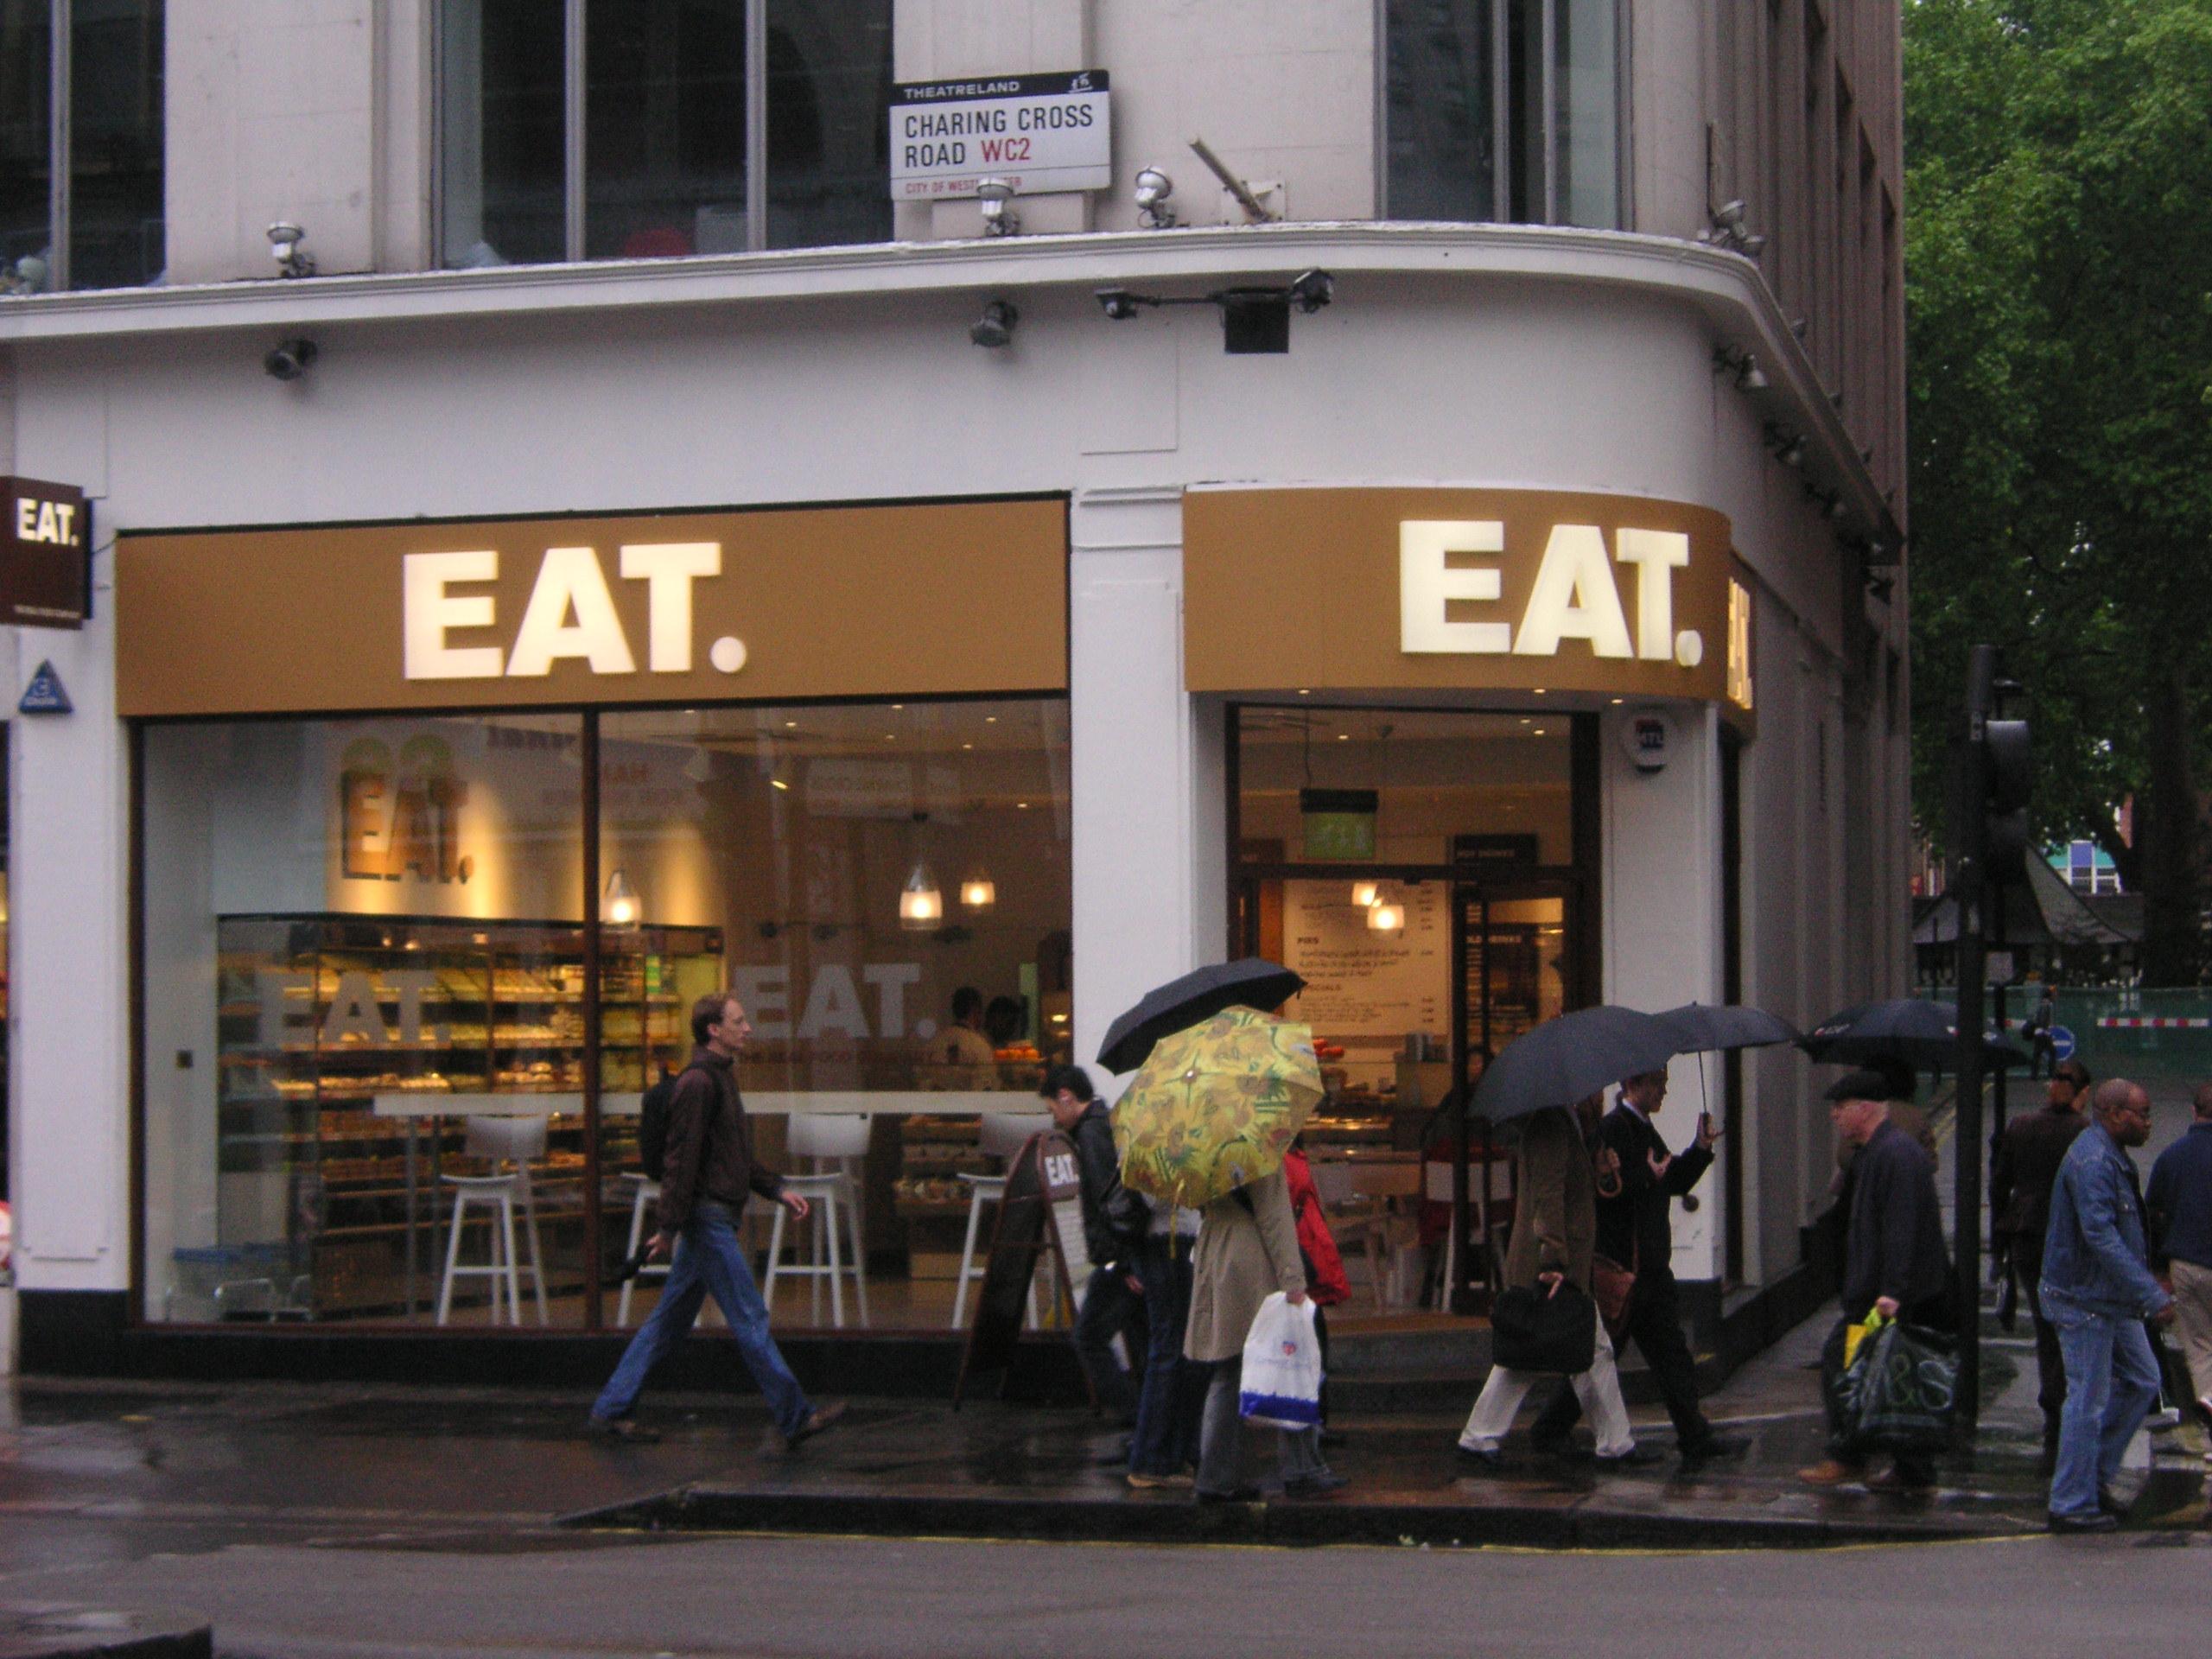 Charing Cross Road London Restaurants